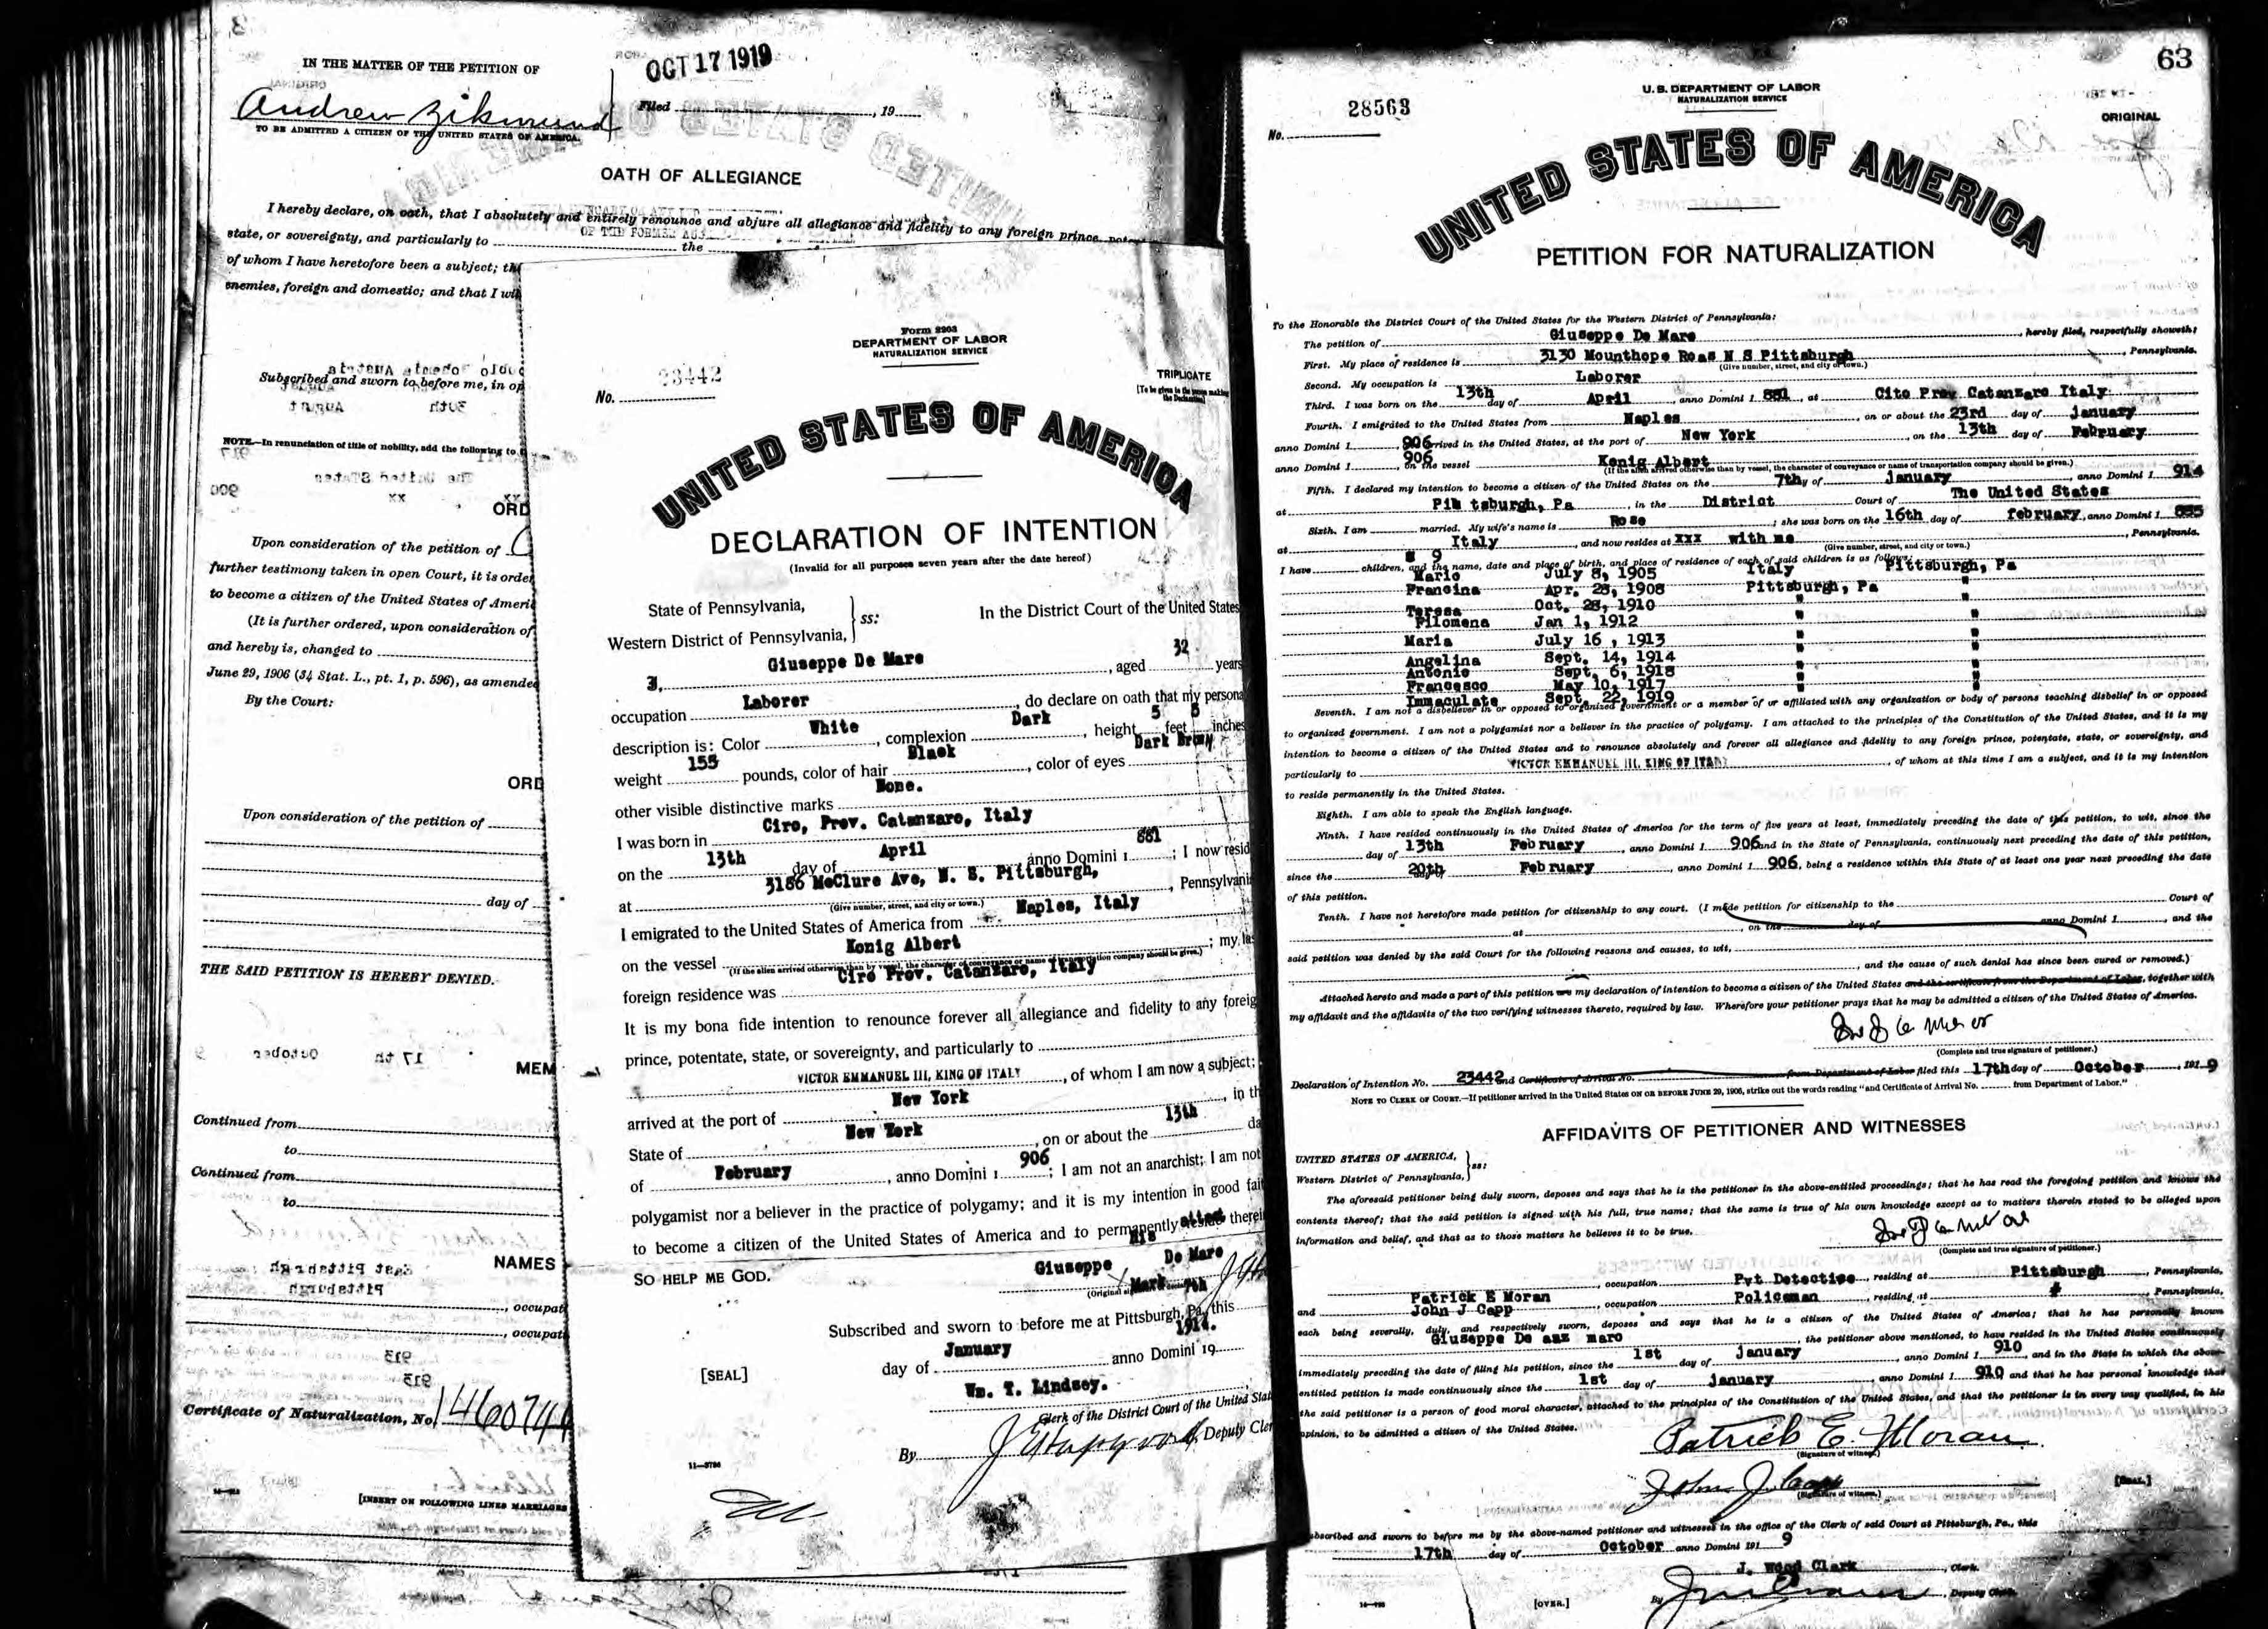 petititon for naturalization_demar